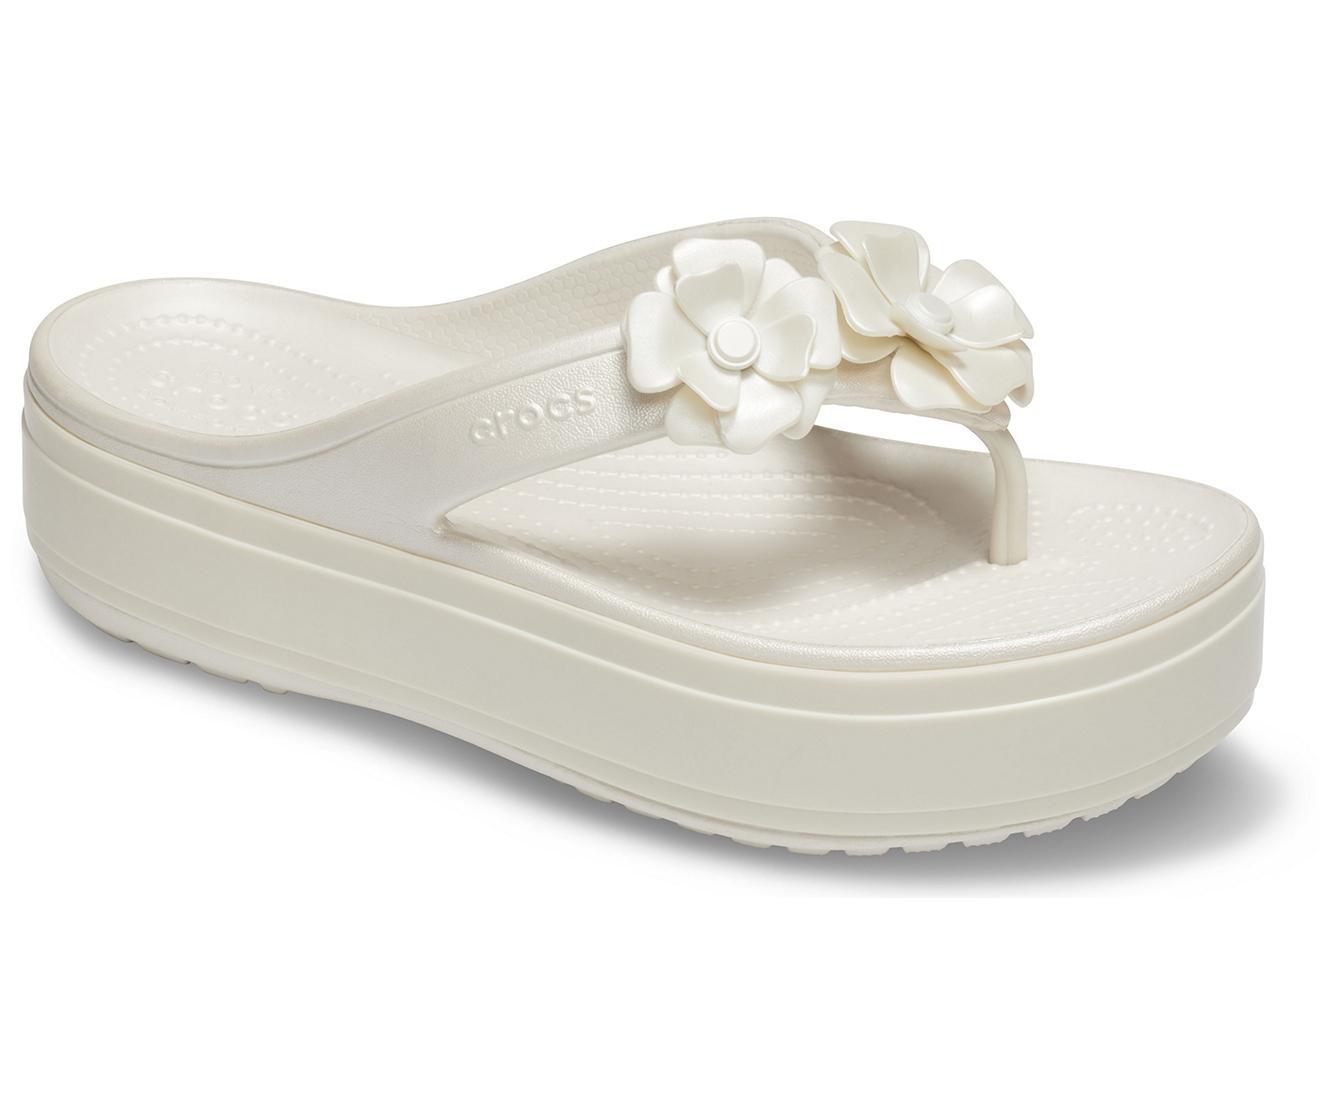 2d7d1ecbceb7 Lyst - Crocs™ Crocband Platform Vivid Blooms Flip in White